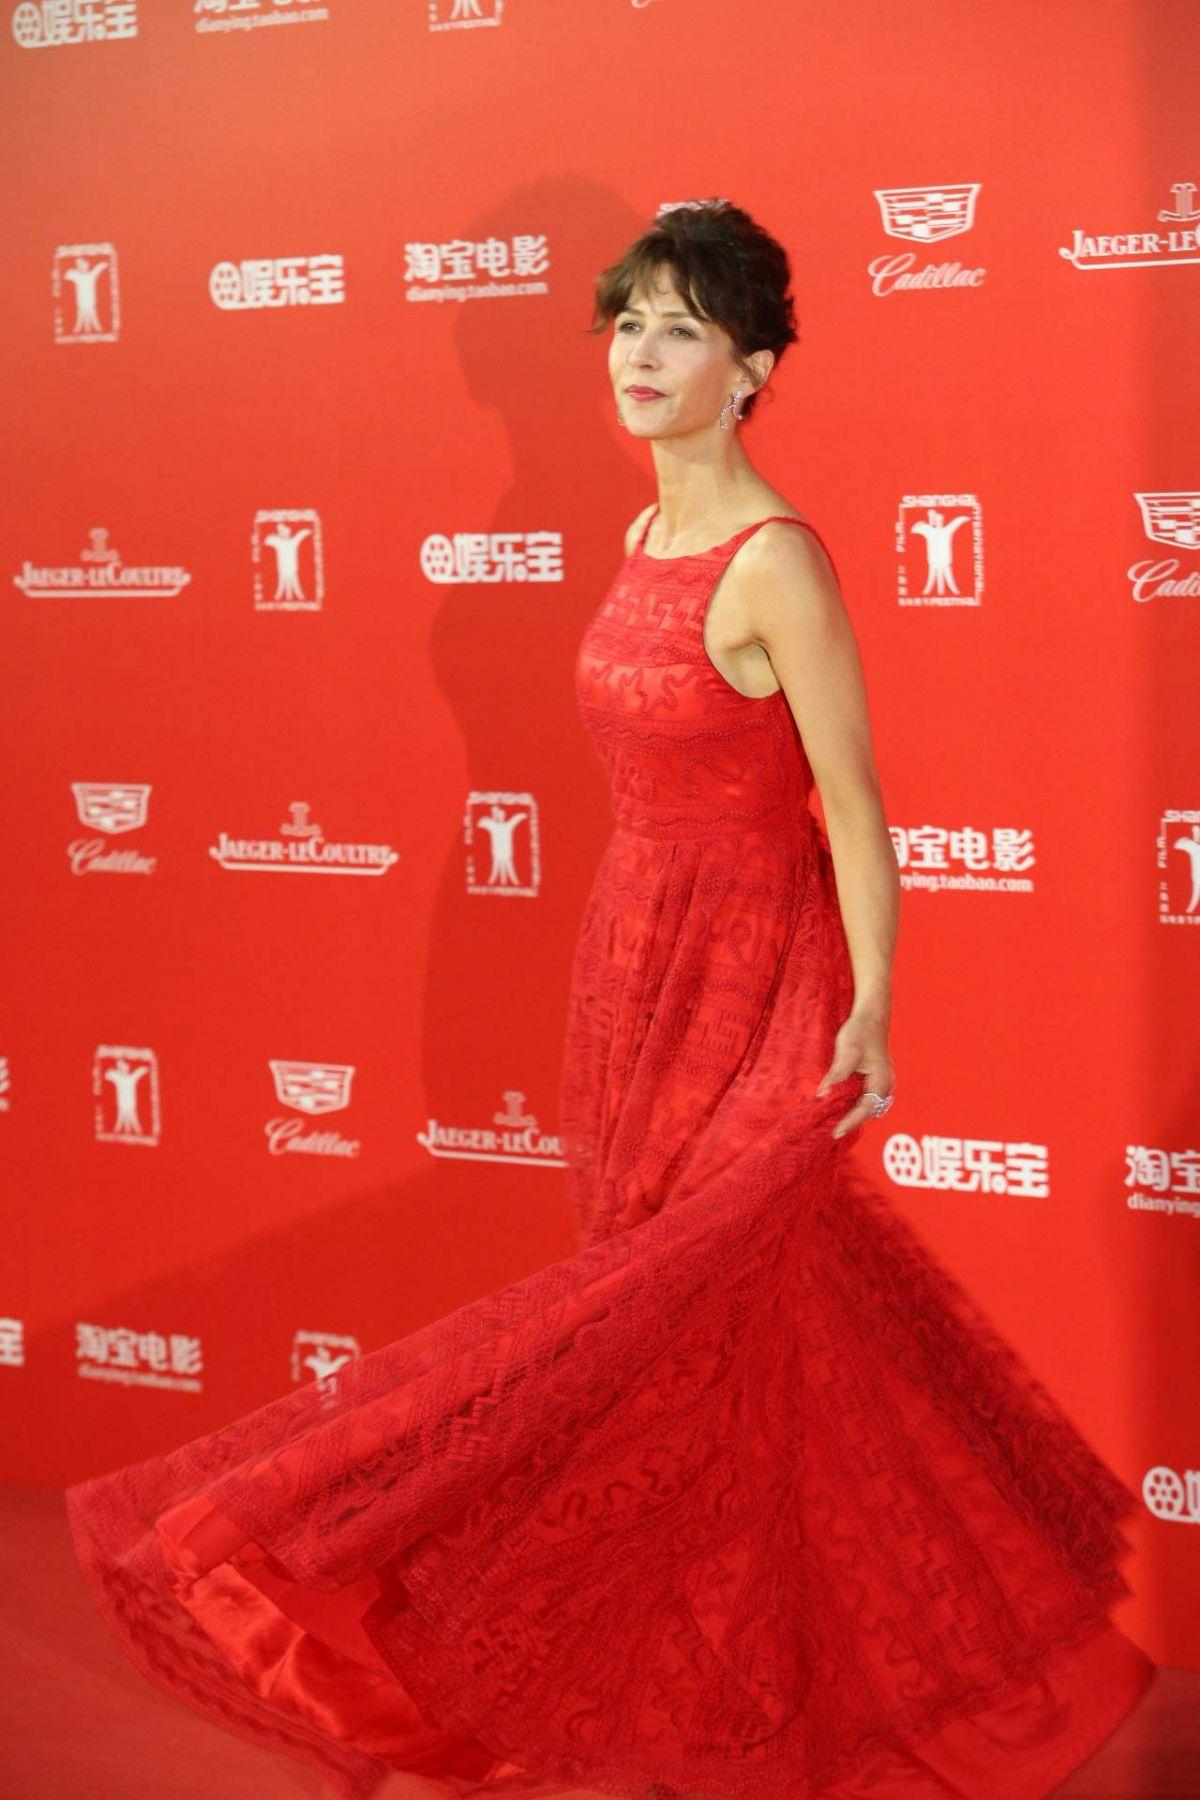 SOPHIE MARCEAU at 2015 Shanghai International Film Festival Closing Ceremony